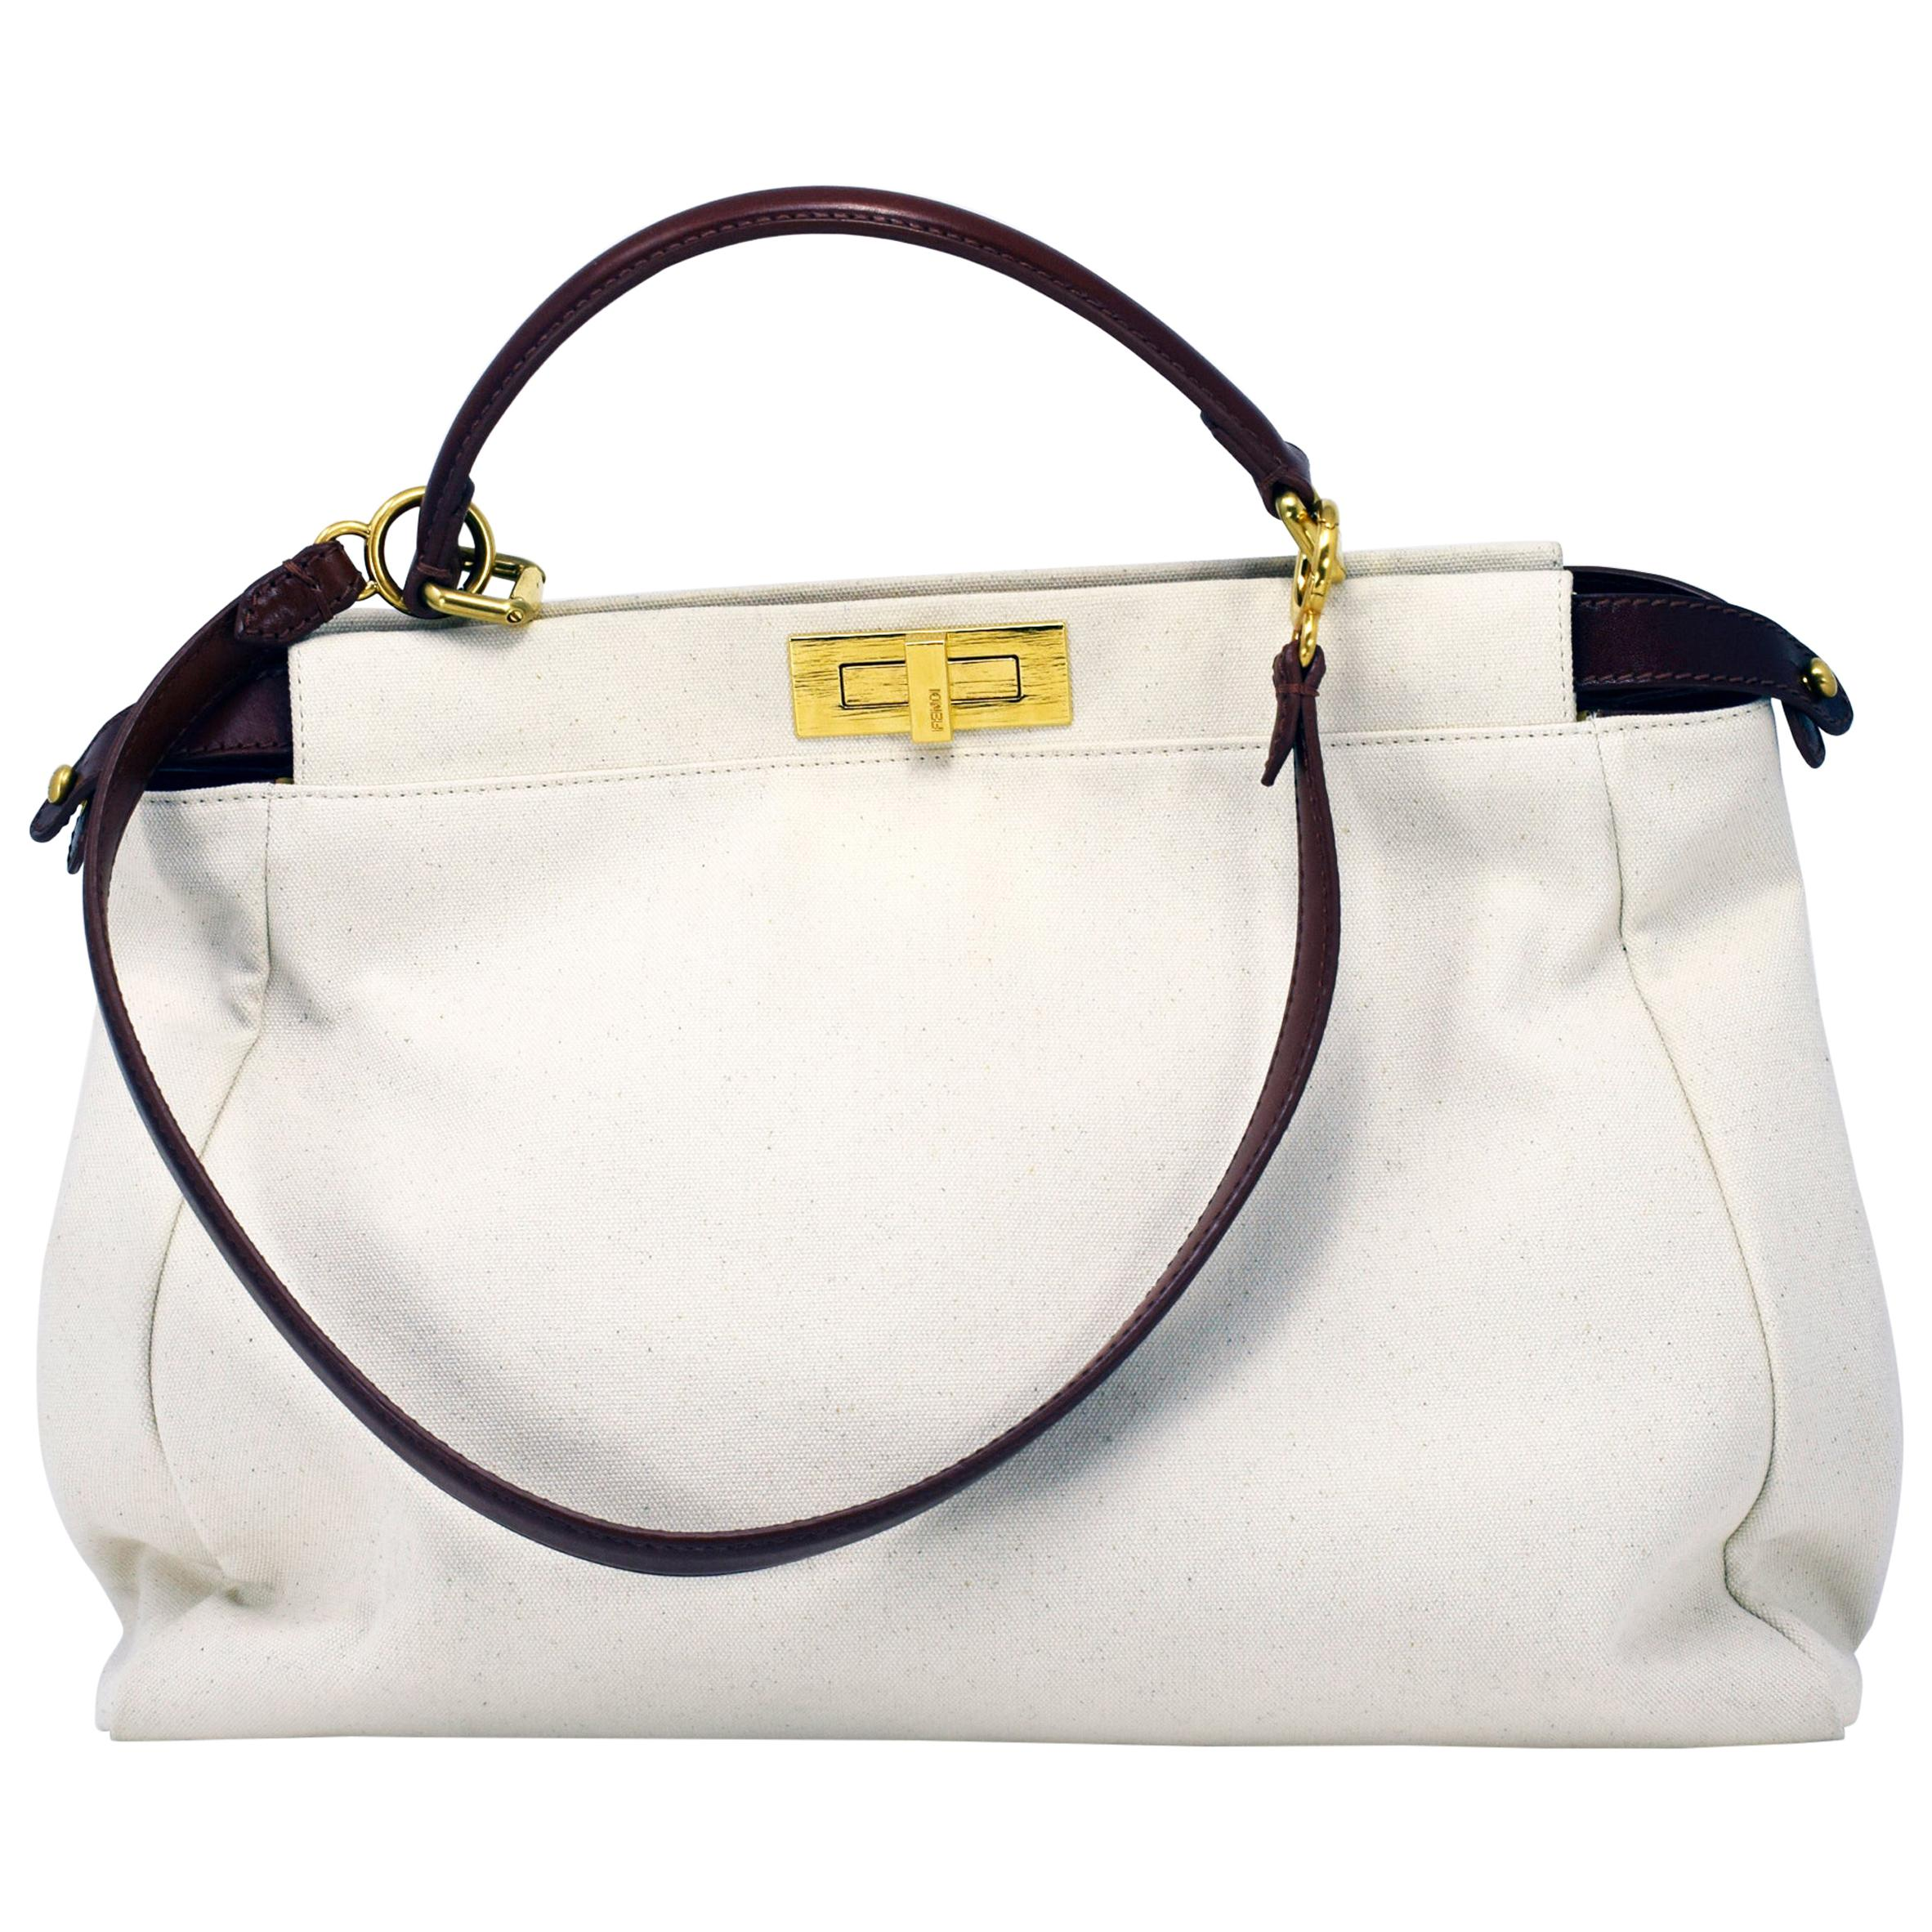 Fendi Peekaboo Large Canvas Handbag